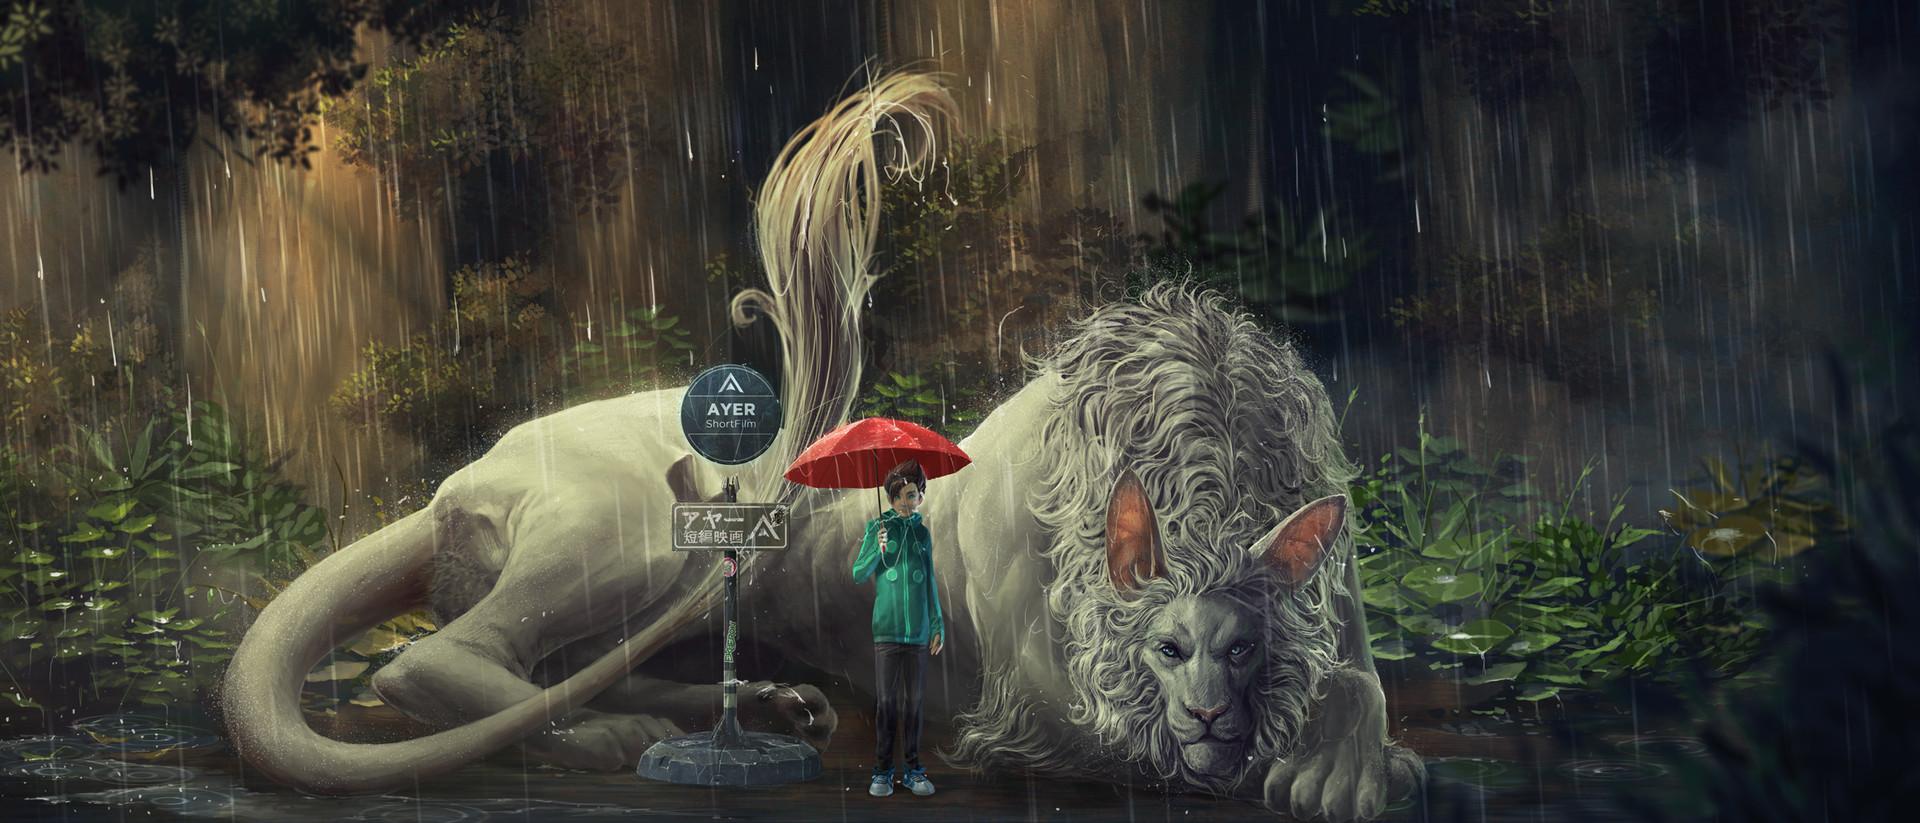 Kaithzer morejon poster matt dragon totoro 2